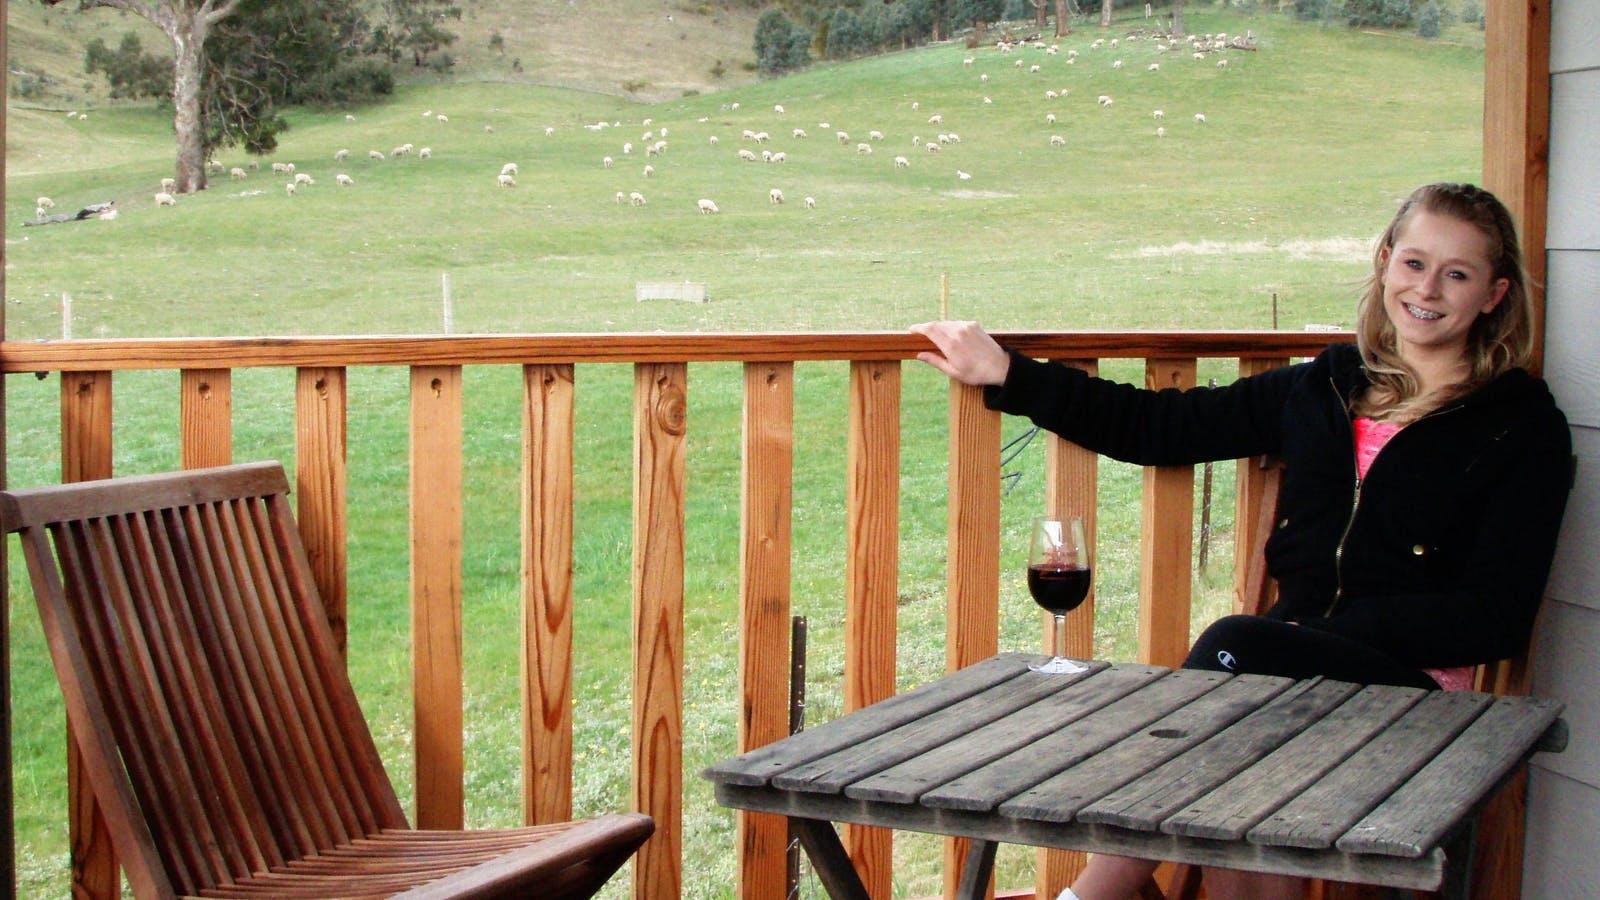 Cottage verandah - Wimmera Hills Winery